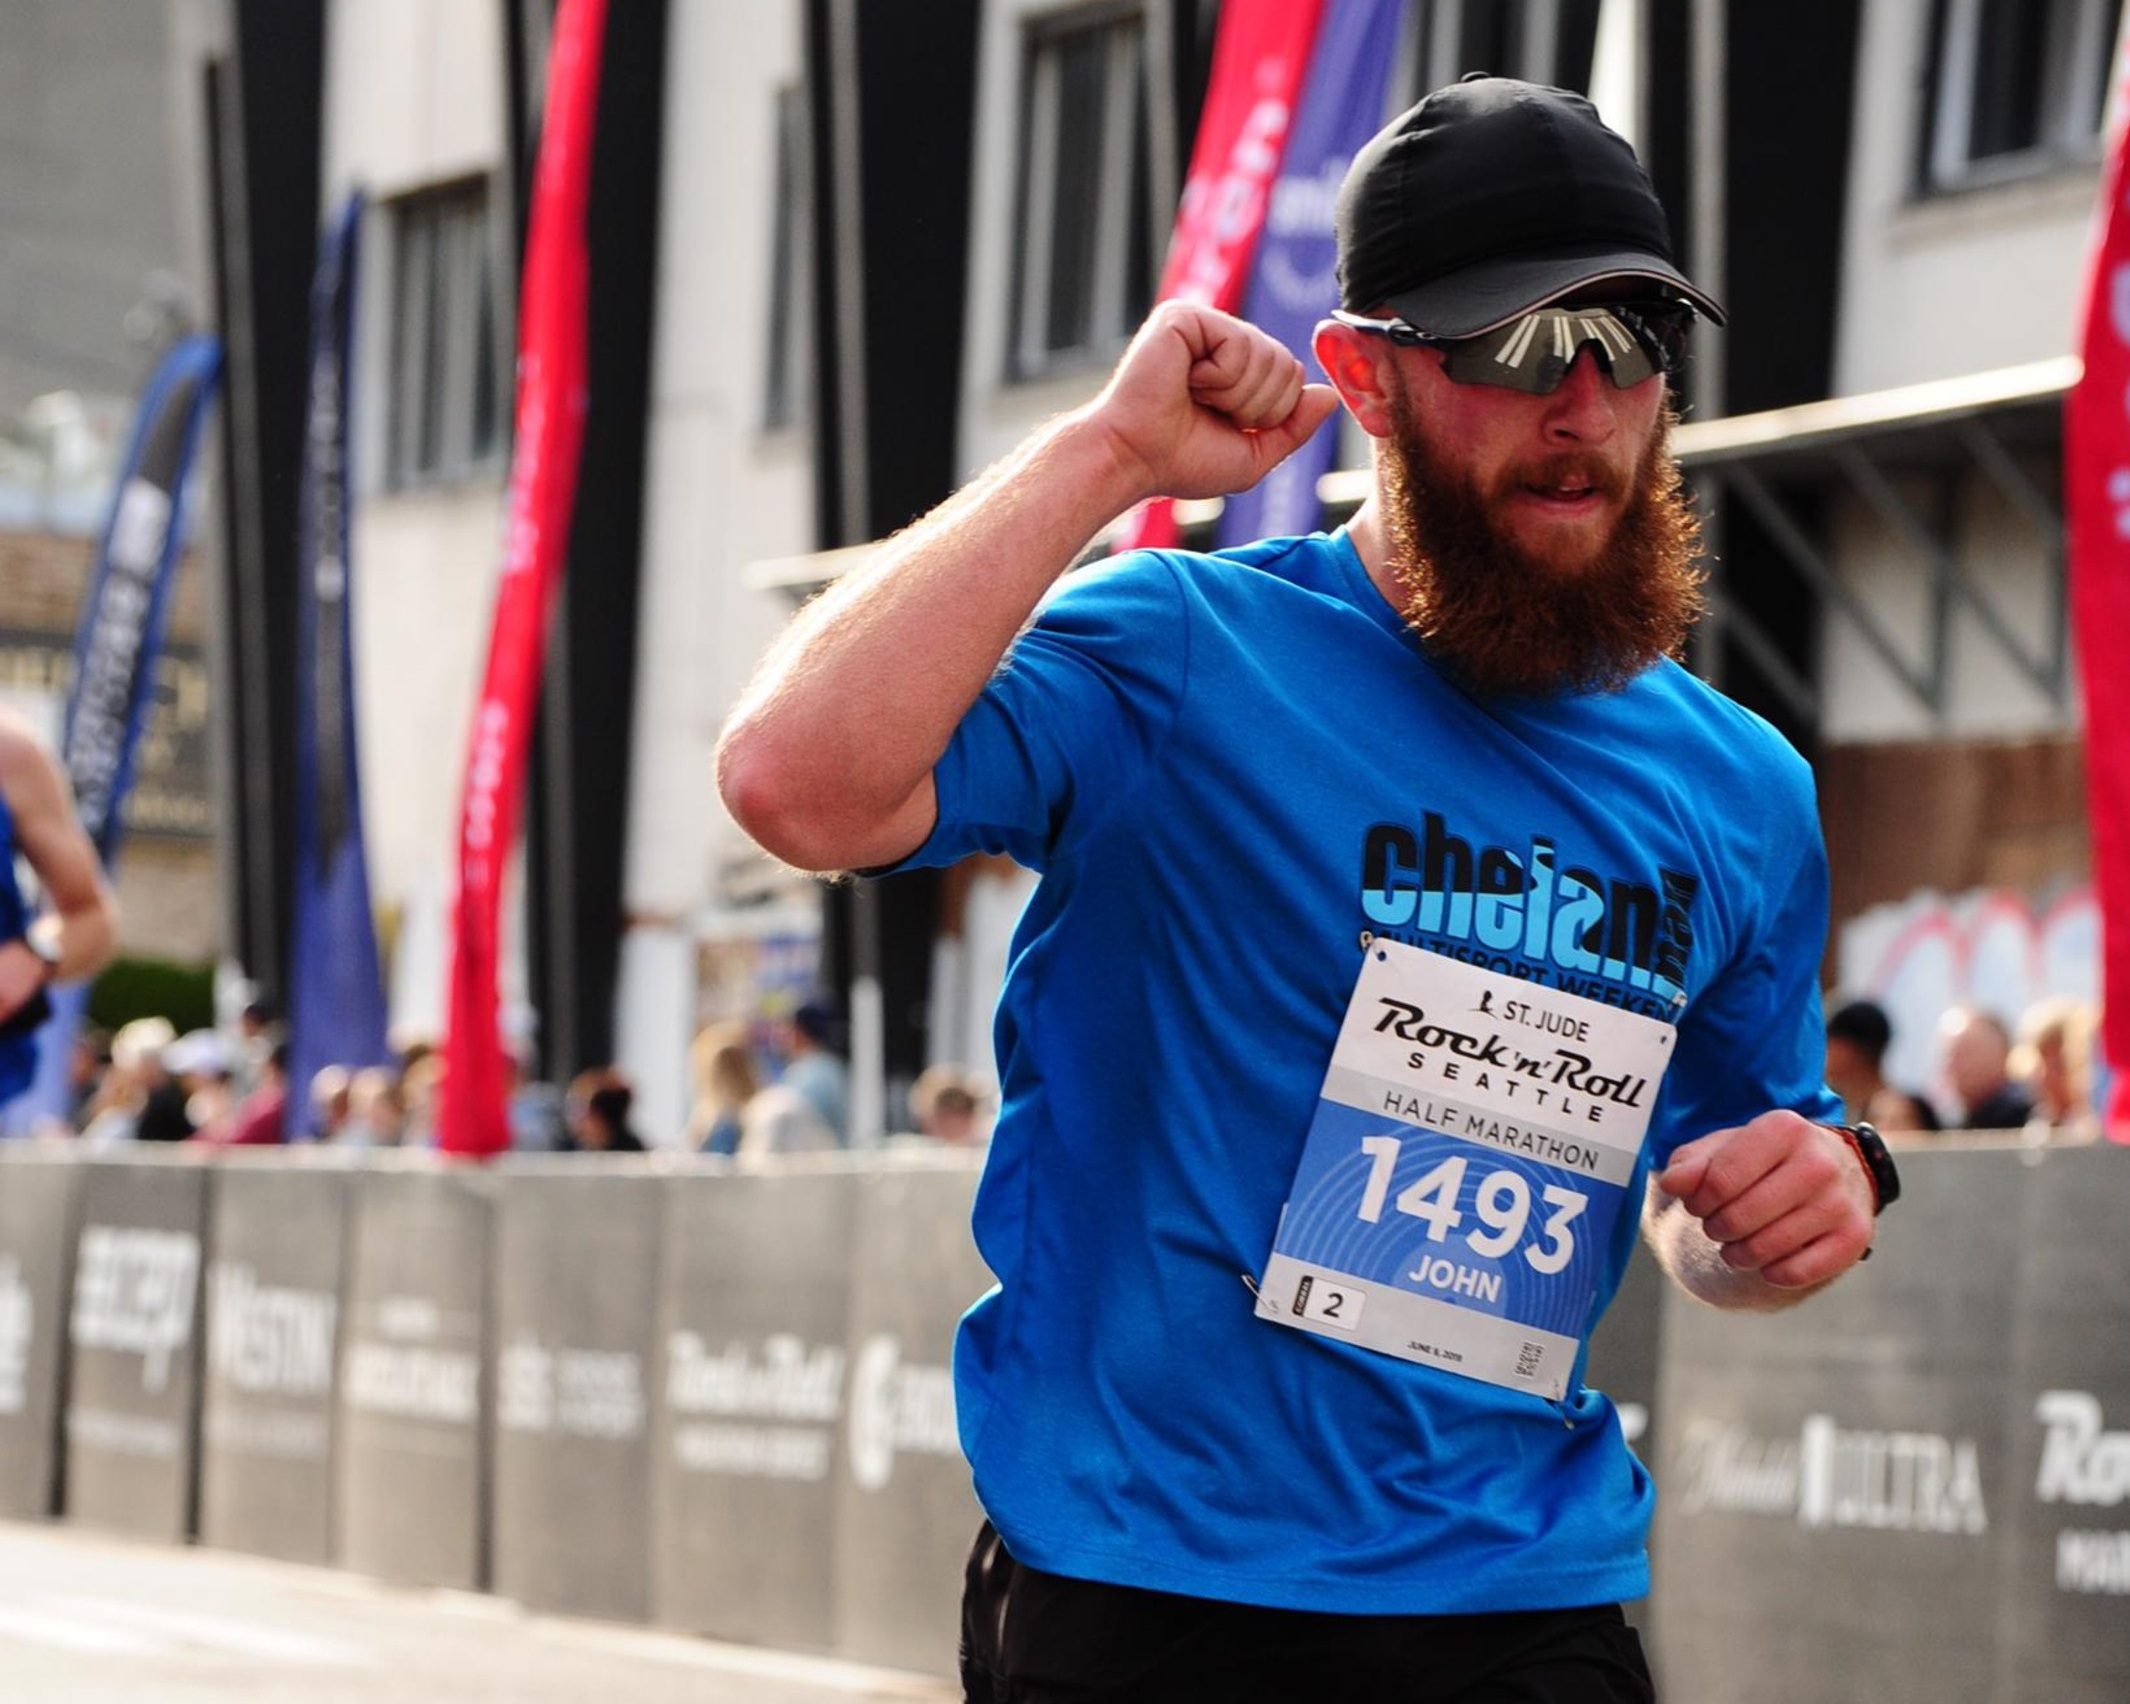 Triumphant 1:38 half-marathon finish.